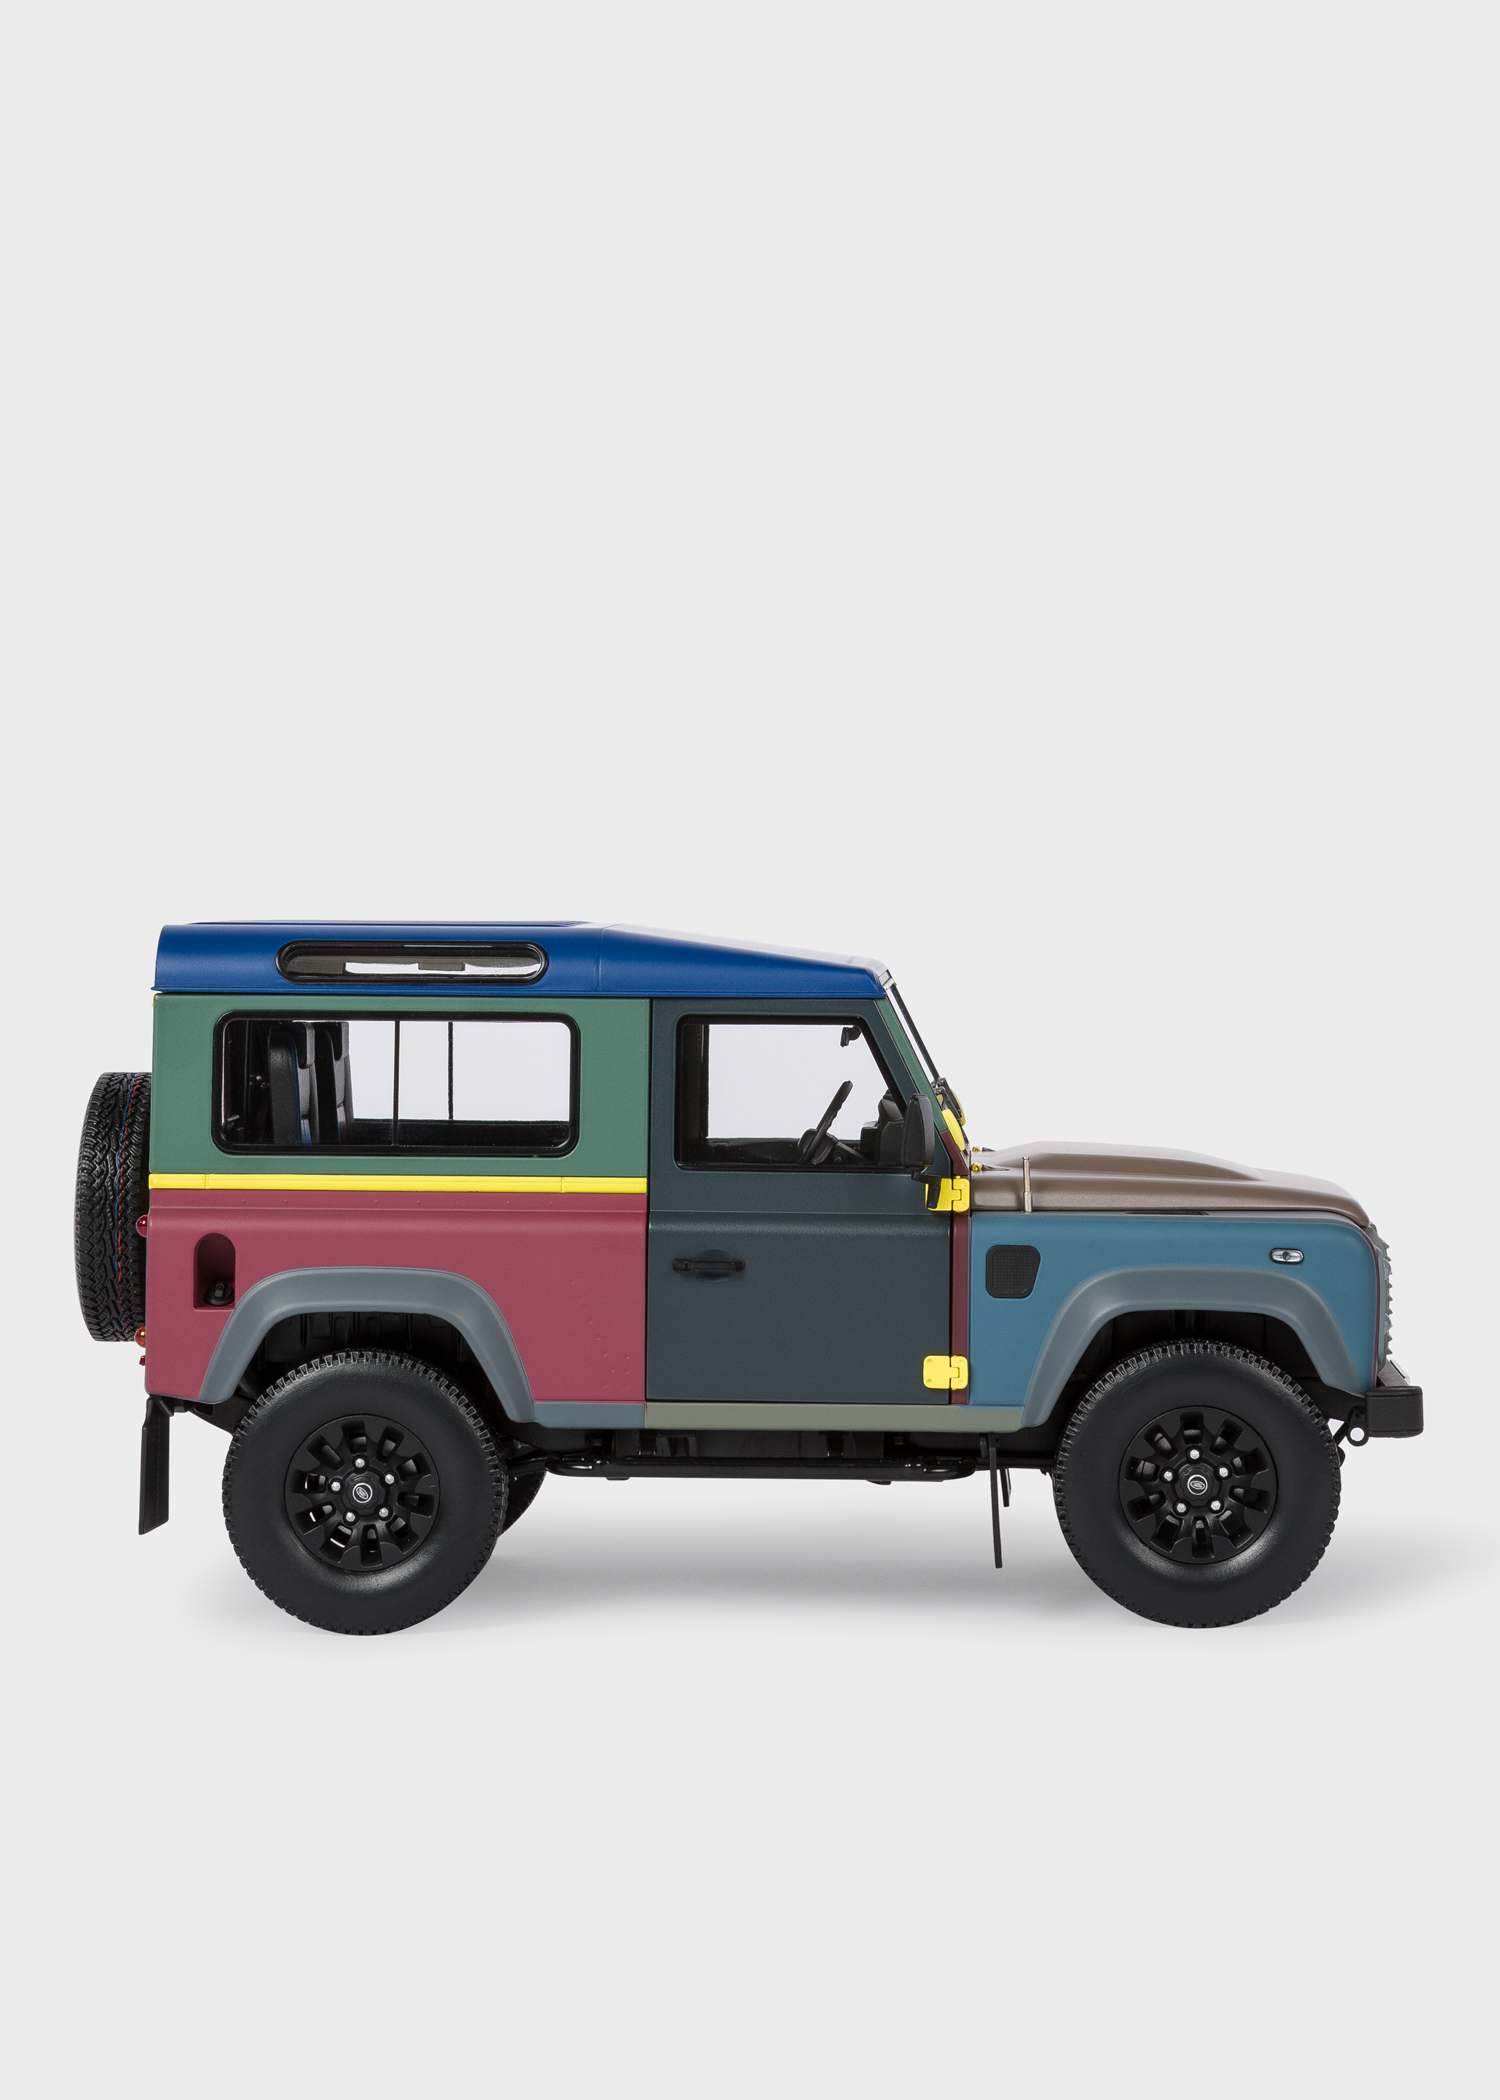 Paul Smith Land Rover Defender 90 1 18 Die Cast Metal